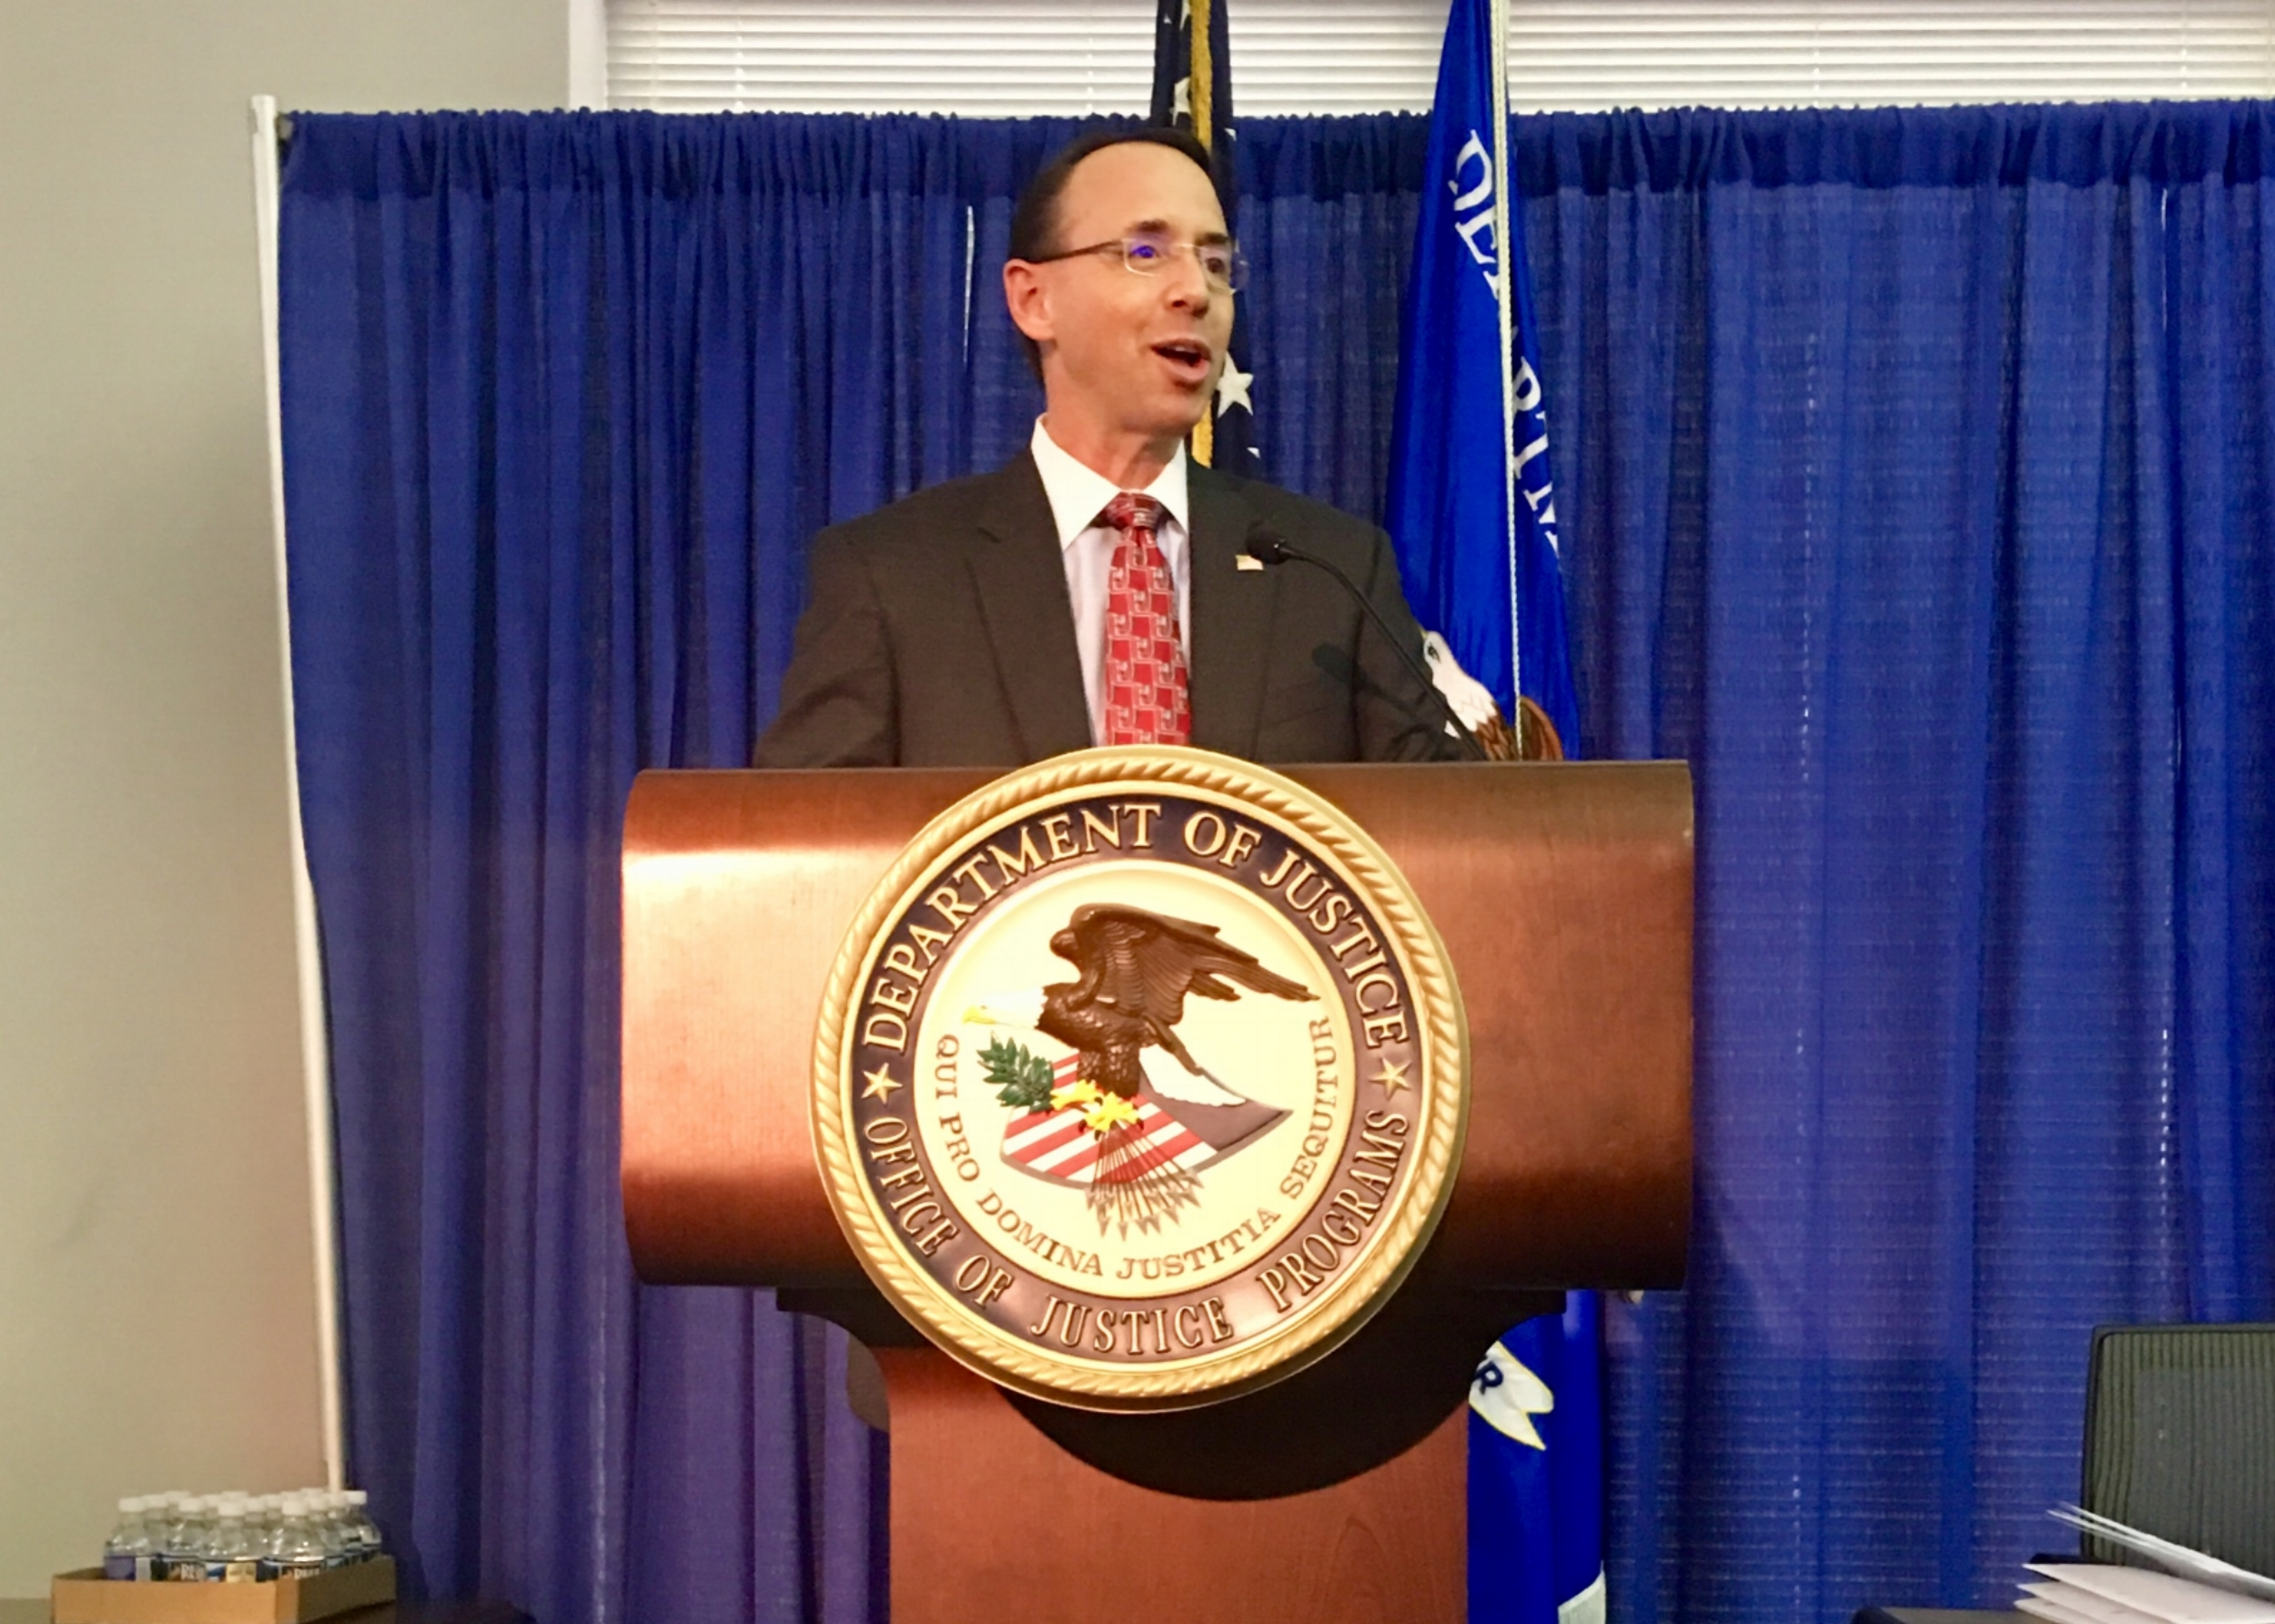 Deputy Attorney General Rod J. Rosenstein at R2C Third Annual Meeting;Photo Credit: NACDL staff